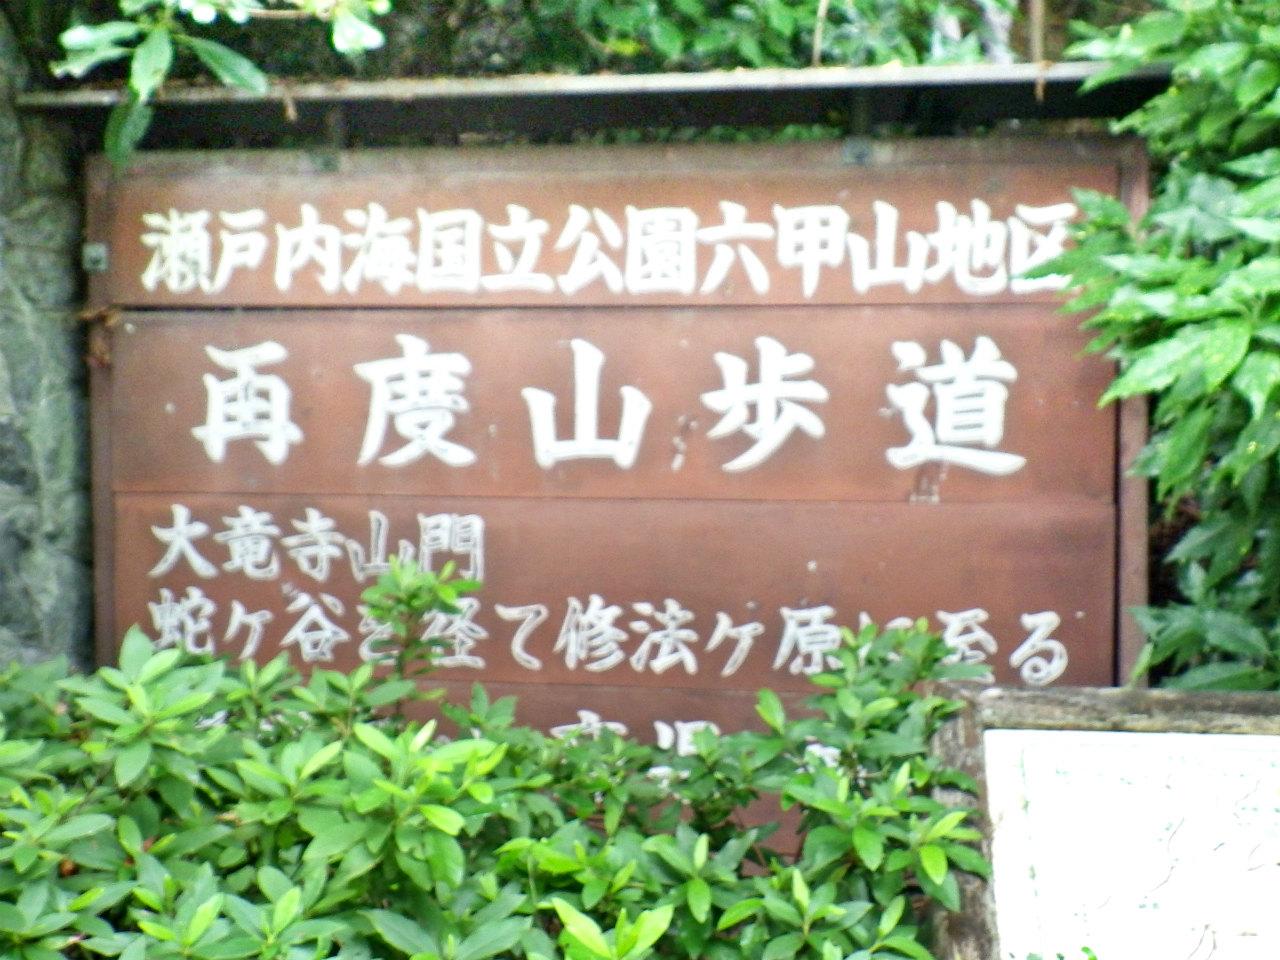 14a 再度山歩道の標識